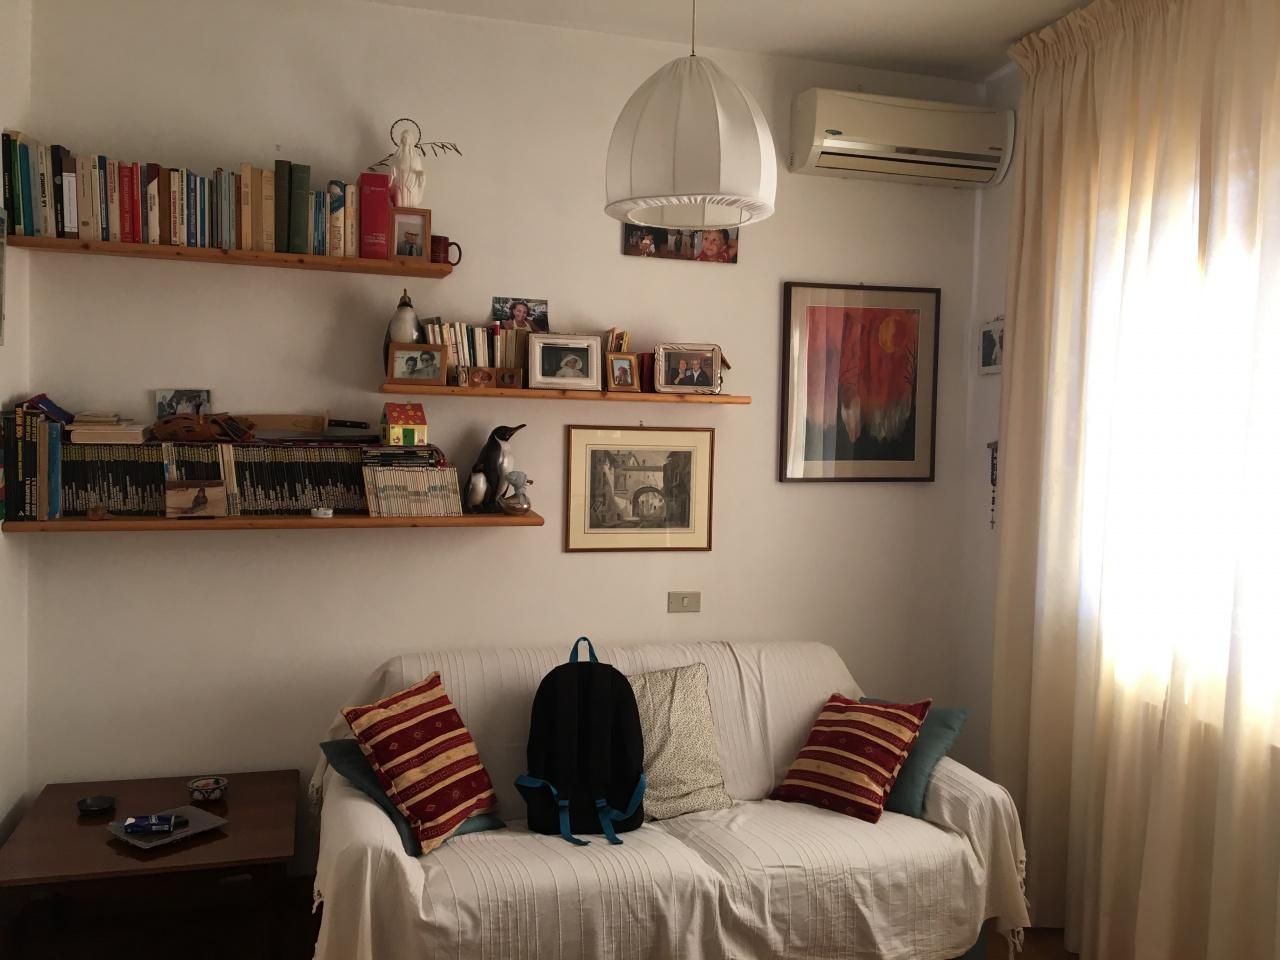 Appartamento, via del portone, Vendita - Monte San Pietro